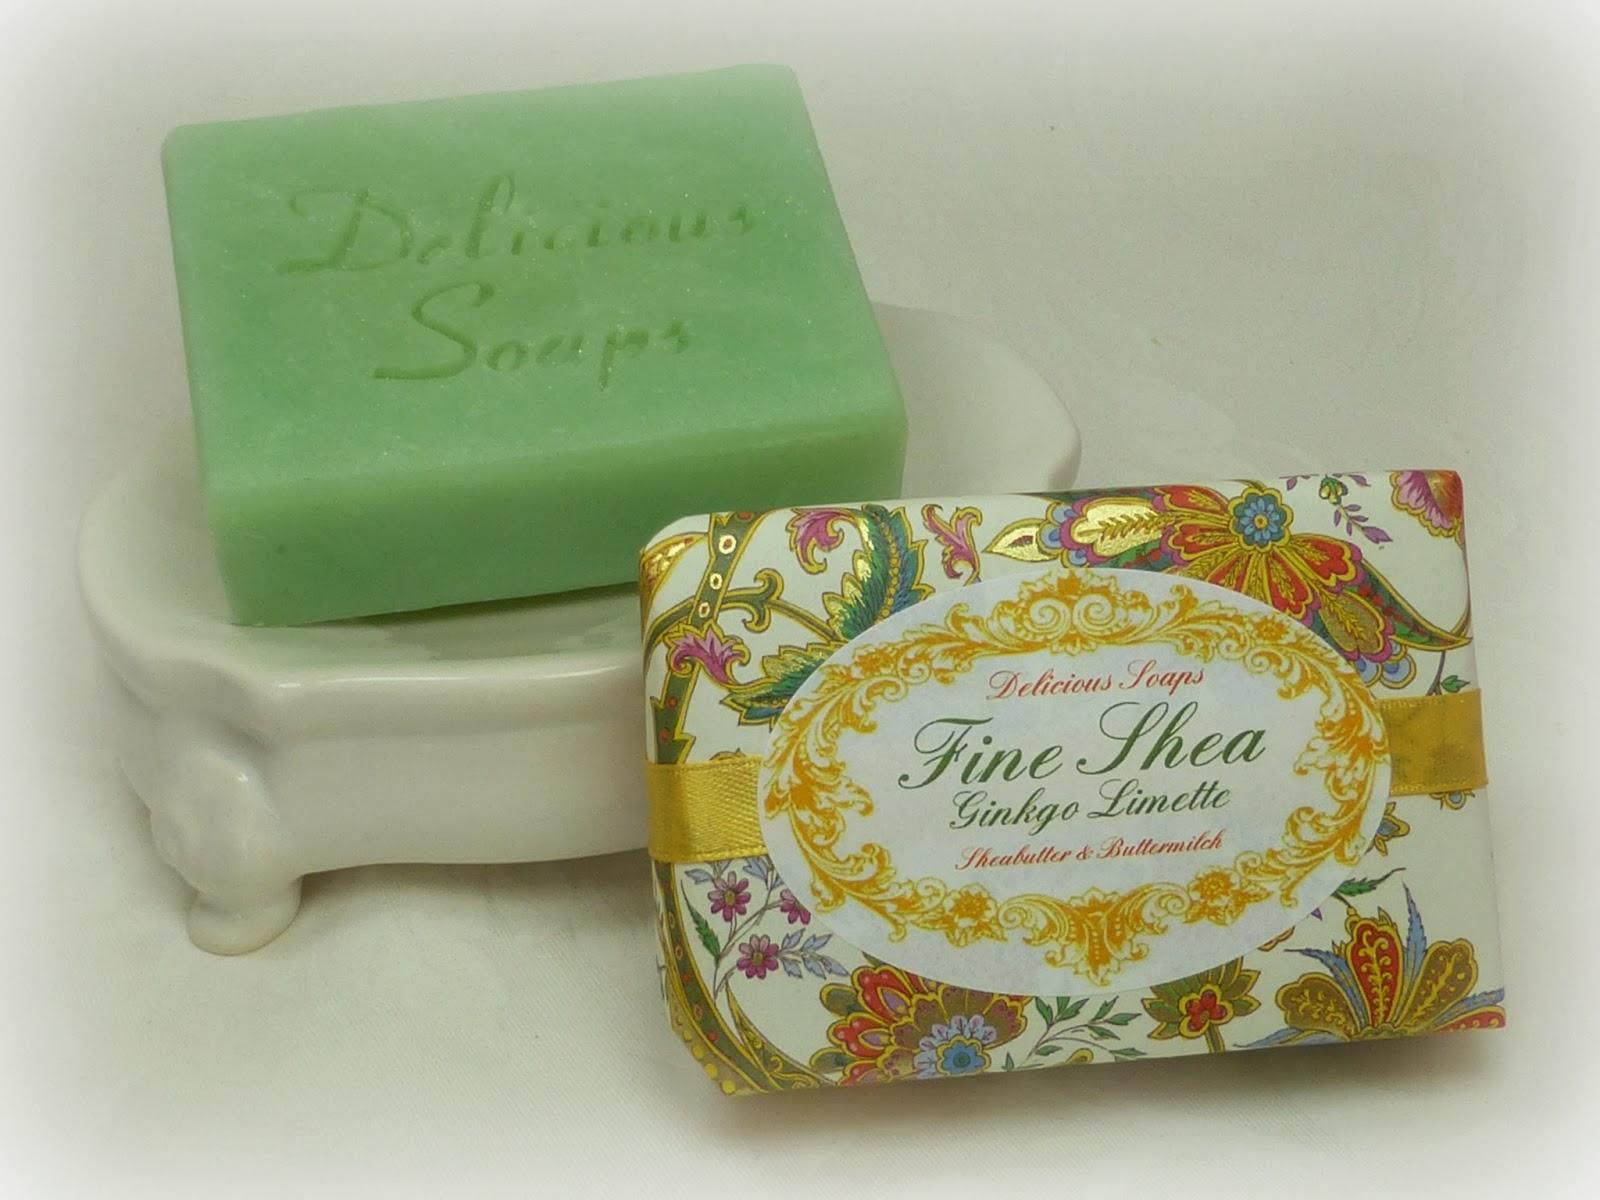 http://www.delicious-soaps.de/seifen/feine-seifen/fine-shea-ginkgo-limette.php